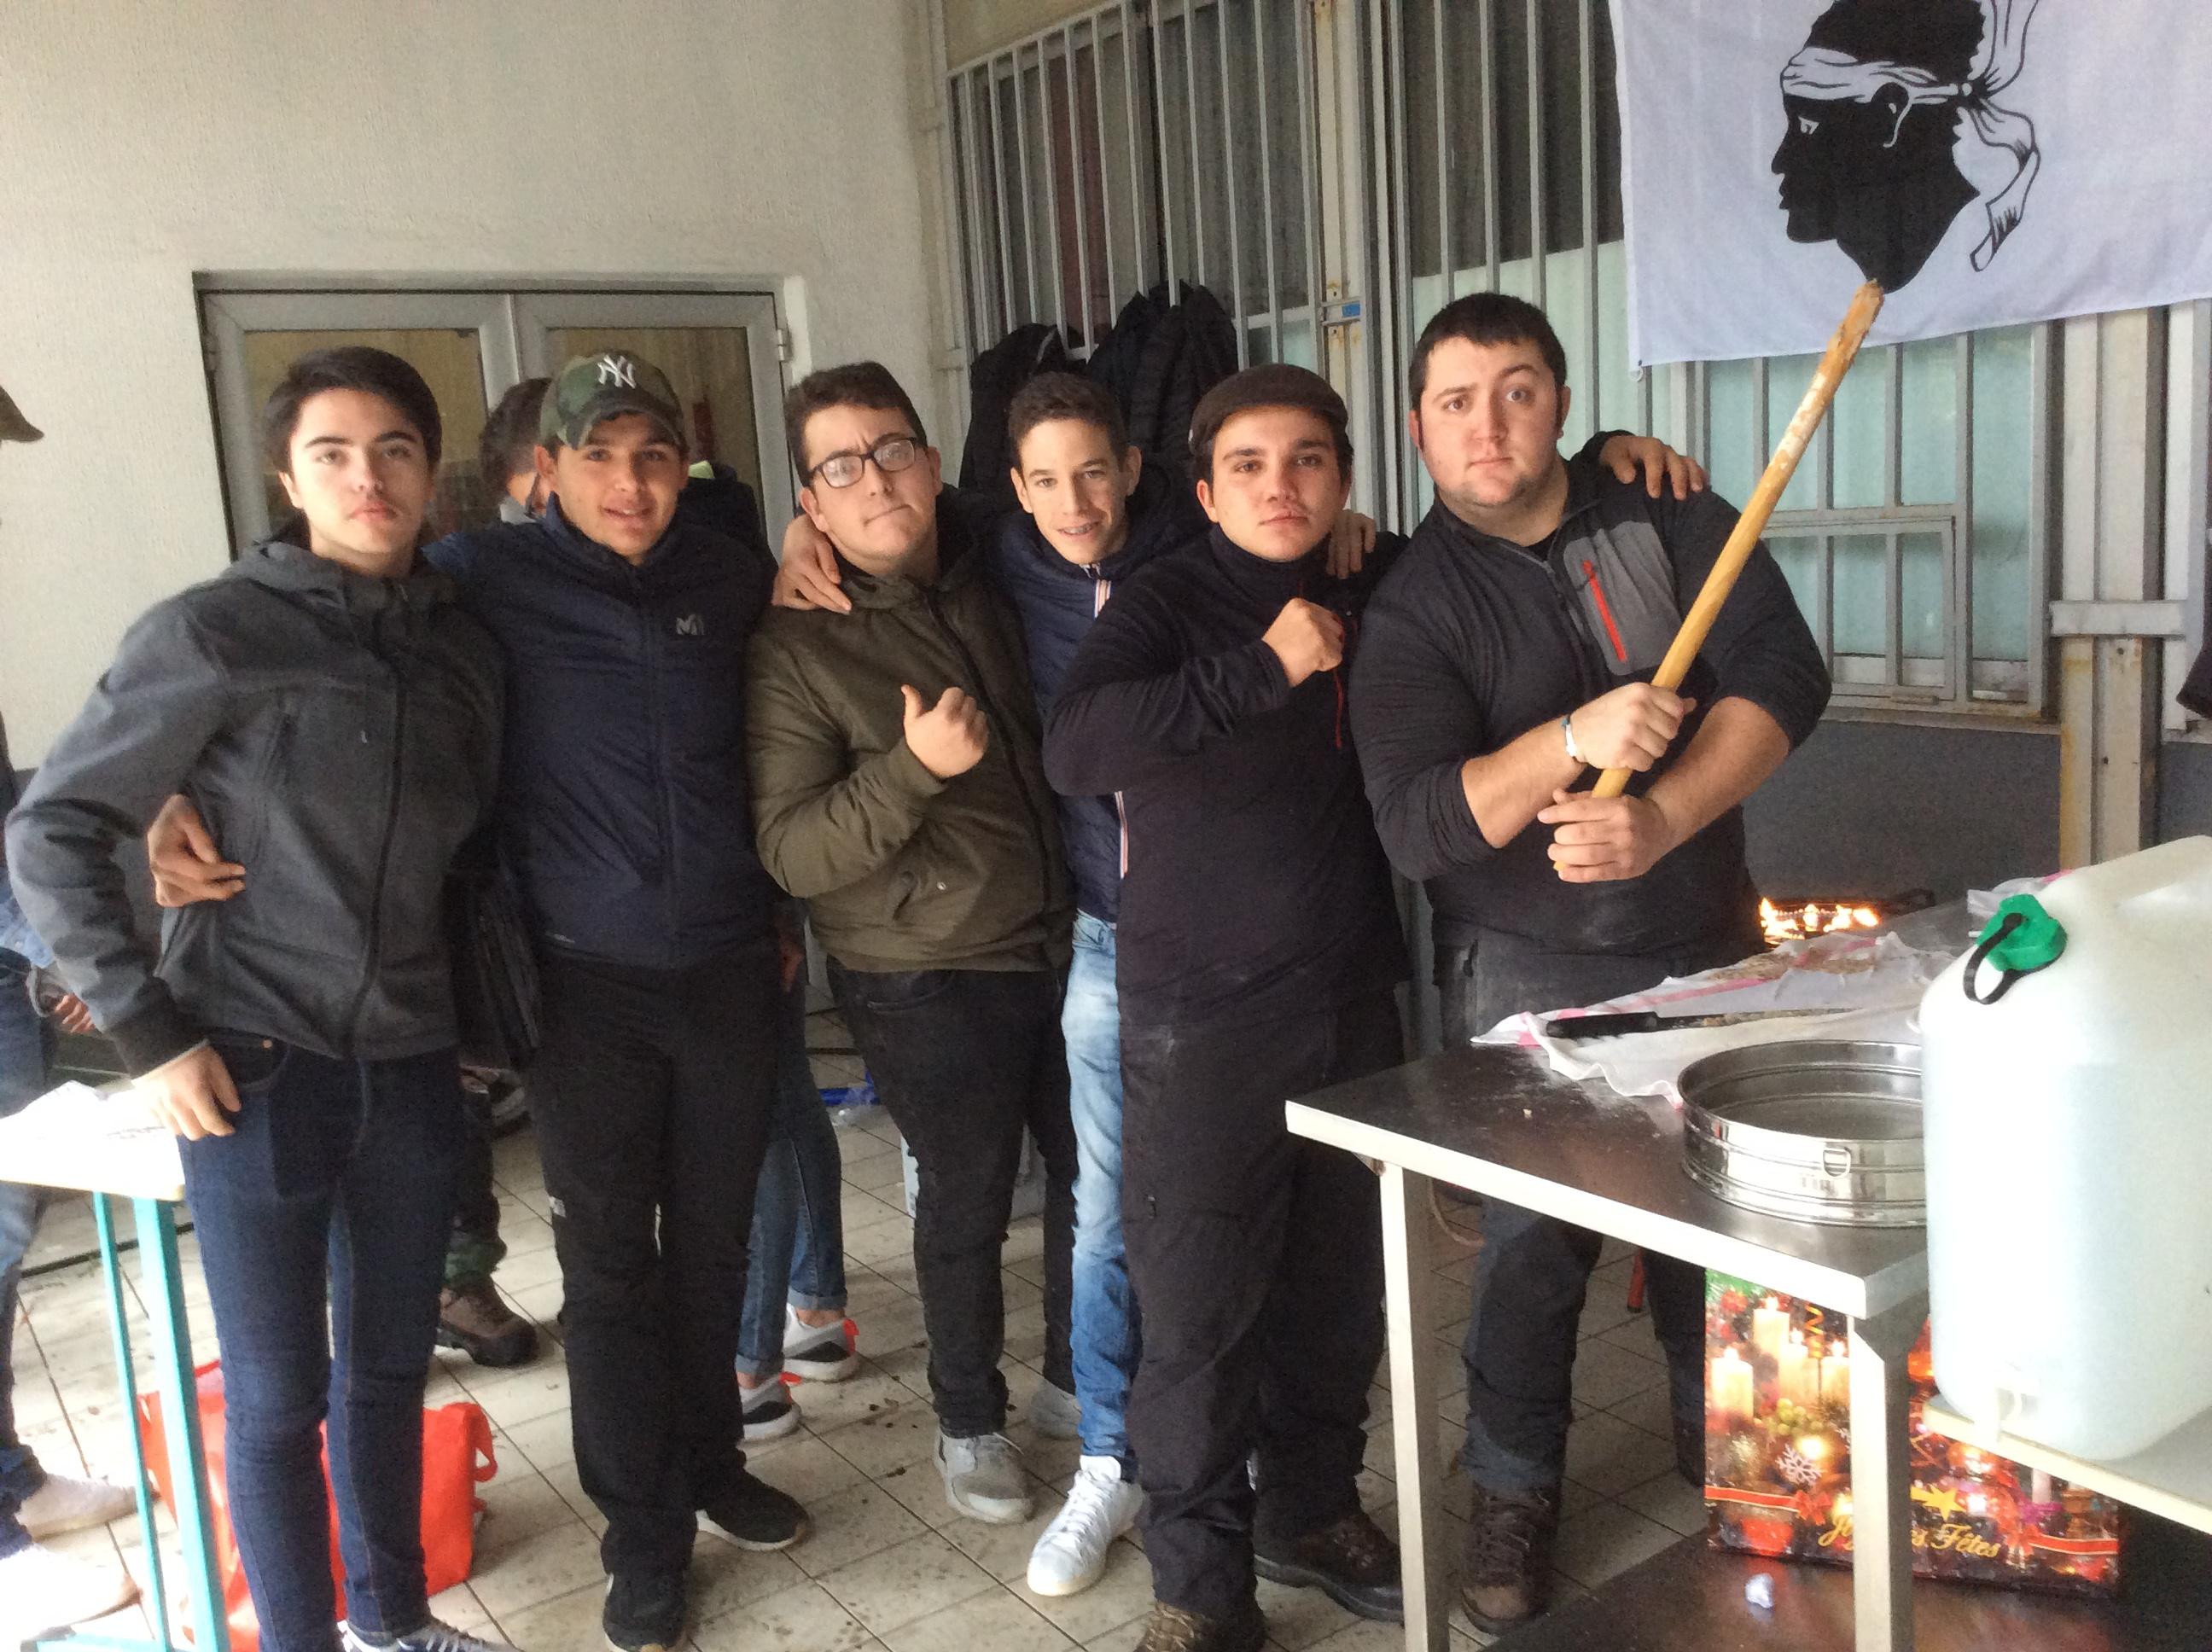 Ajaccio: A Festa di a Nazione dignement célébrée au Lycée Professionnel Finosello